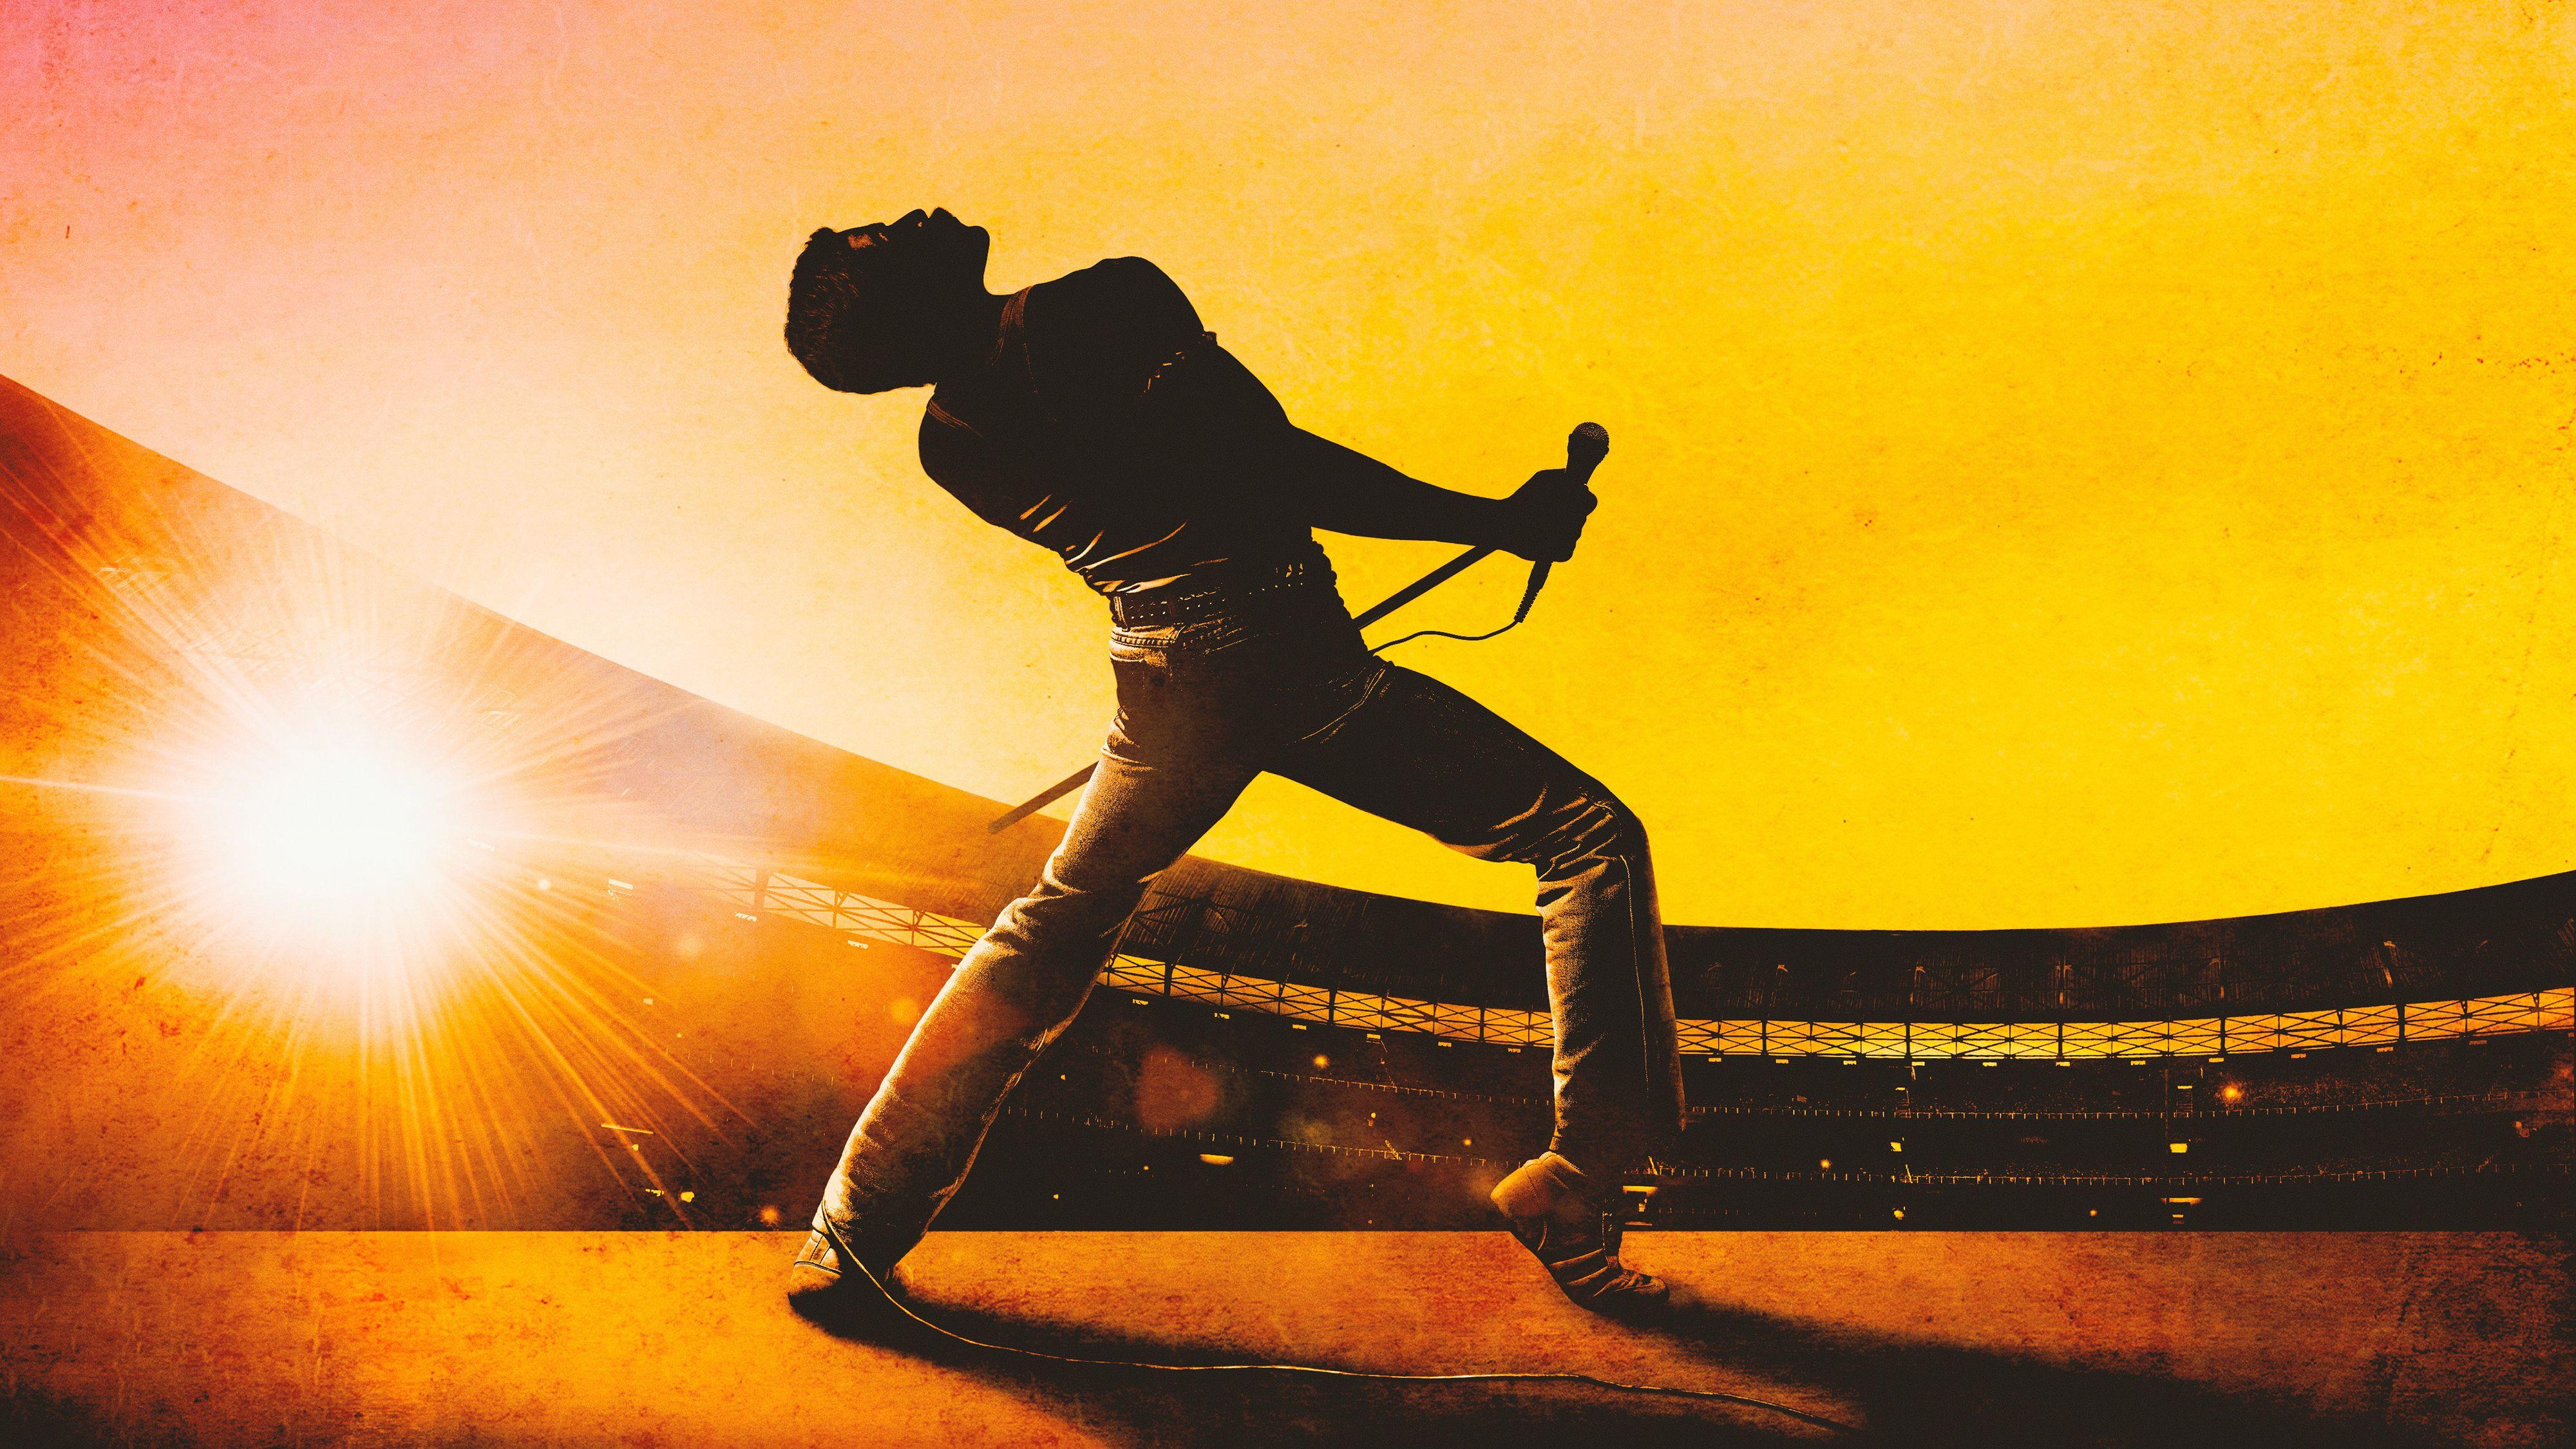 Bohemian Rhapsody 2018 4K Freddie mercury, Rami malek